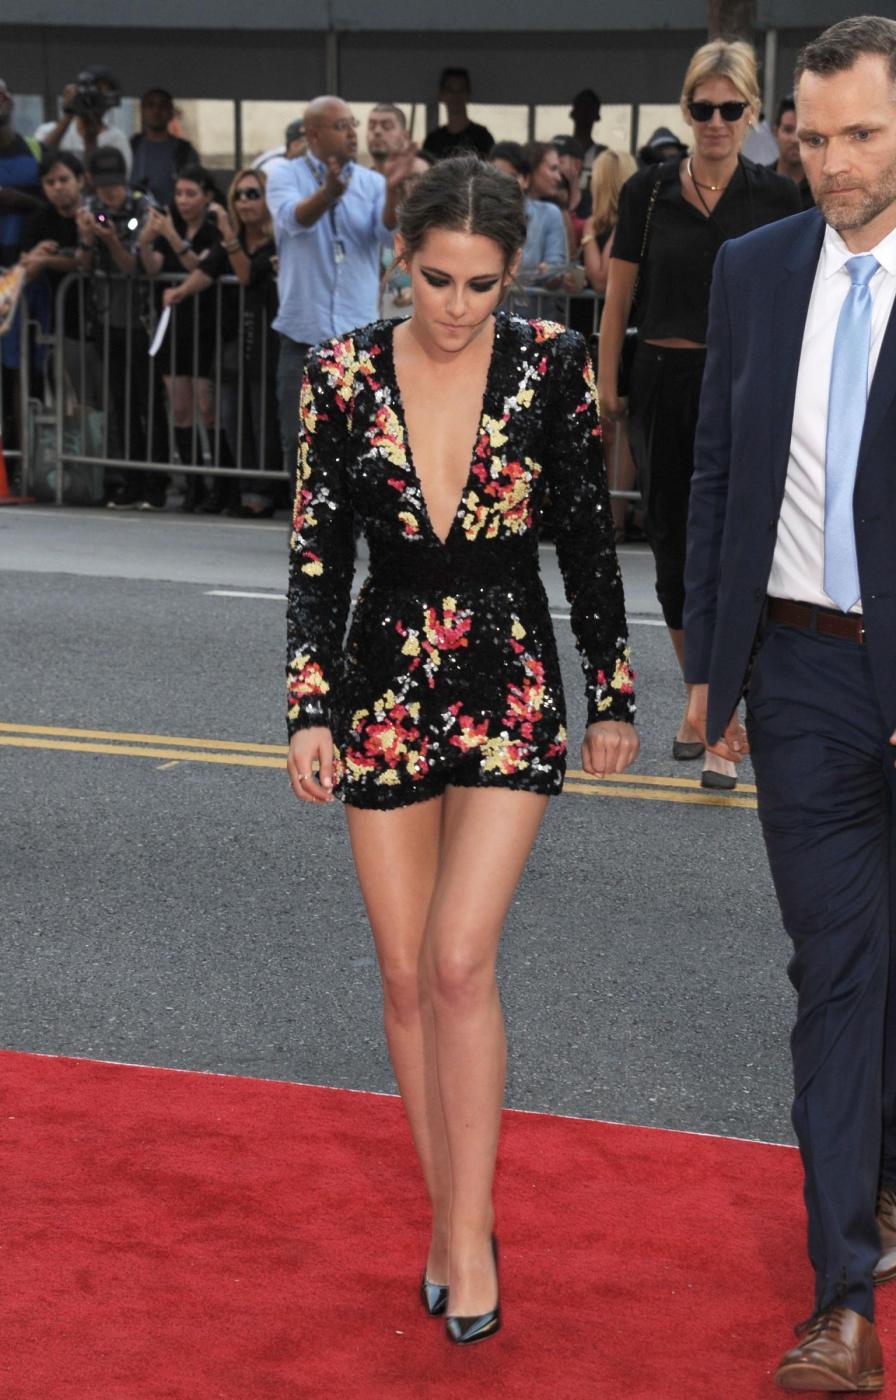 Kristen Stewart, mini abito firmato Zuhair Murad a Los Angeles 13